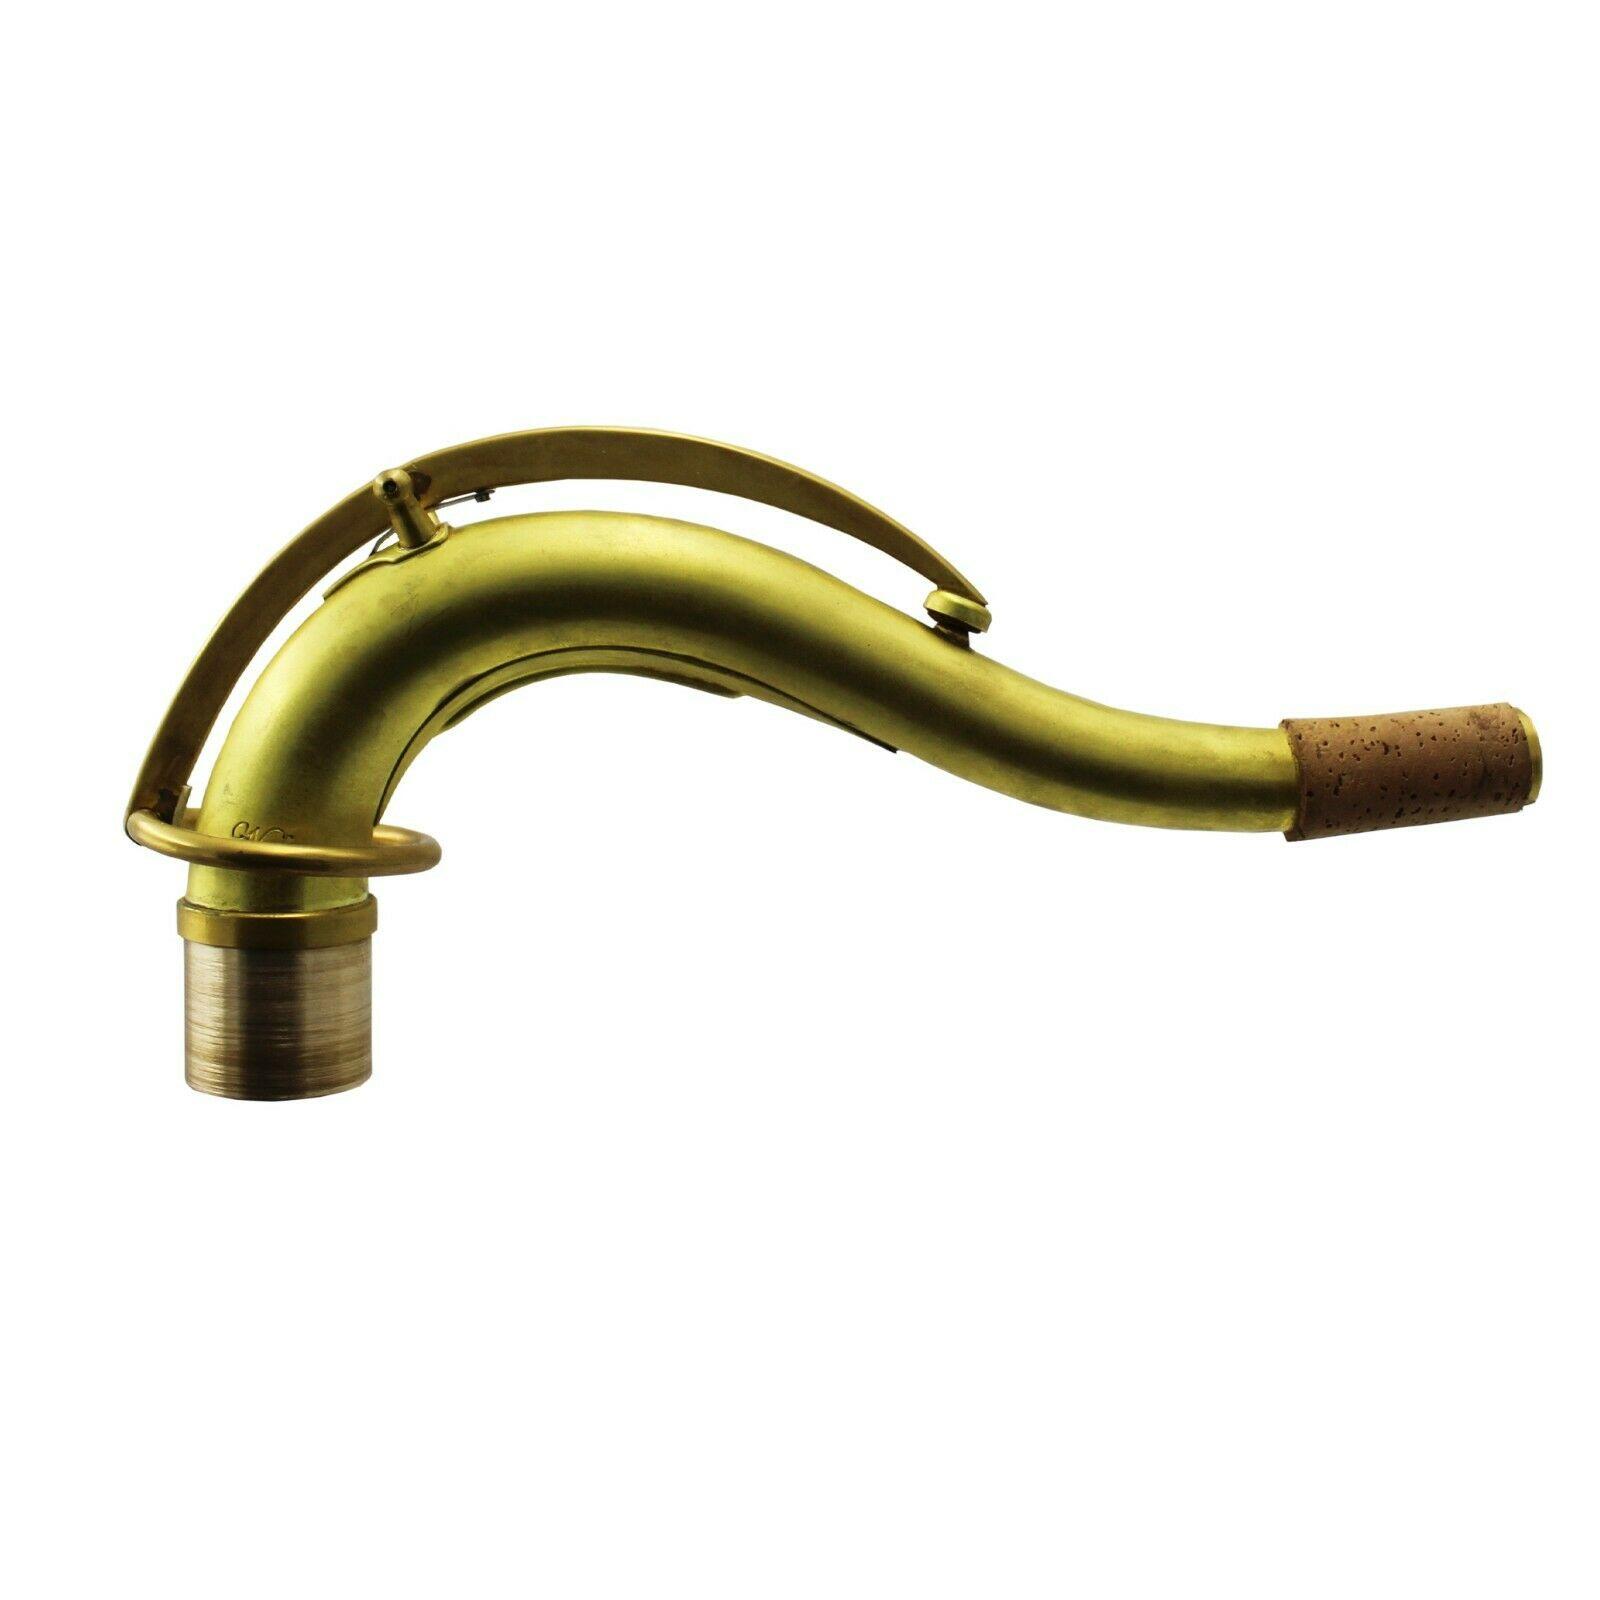 Music C10 Type Original Bare Brass Unlacquered Tenor Saxophone Neck